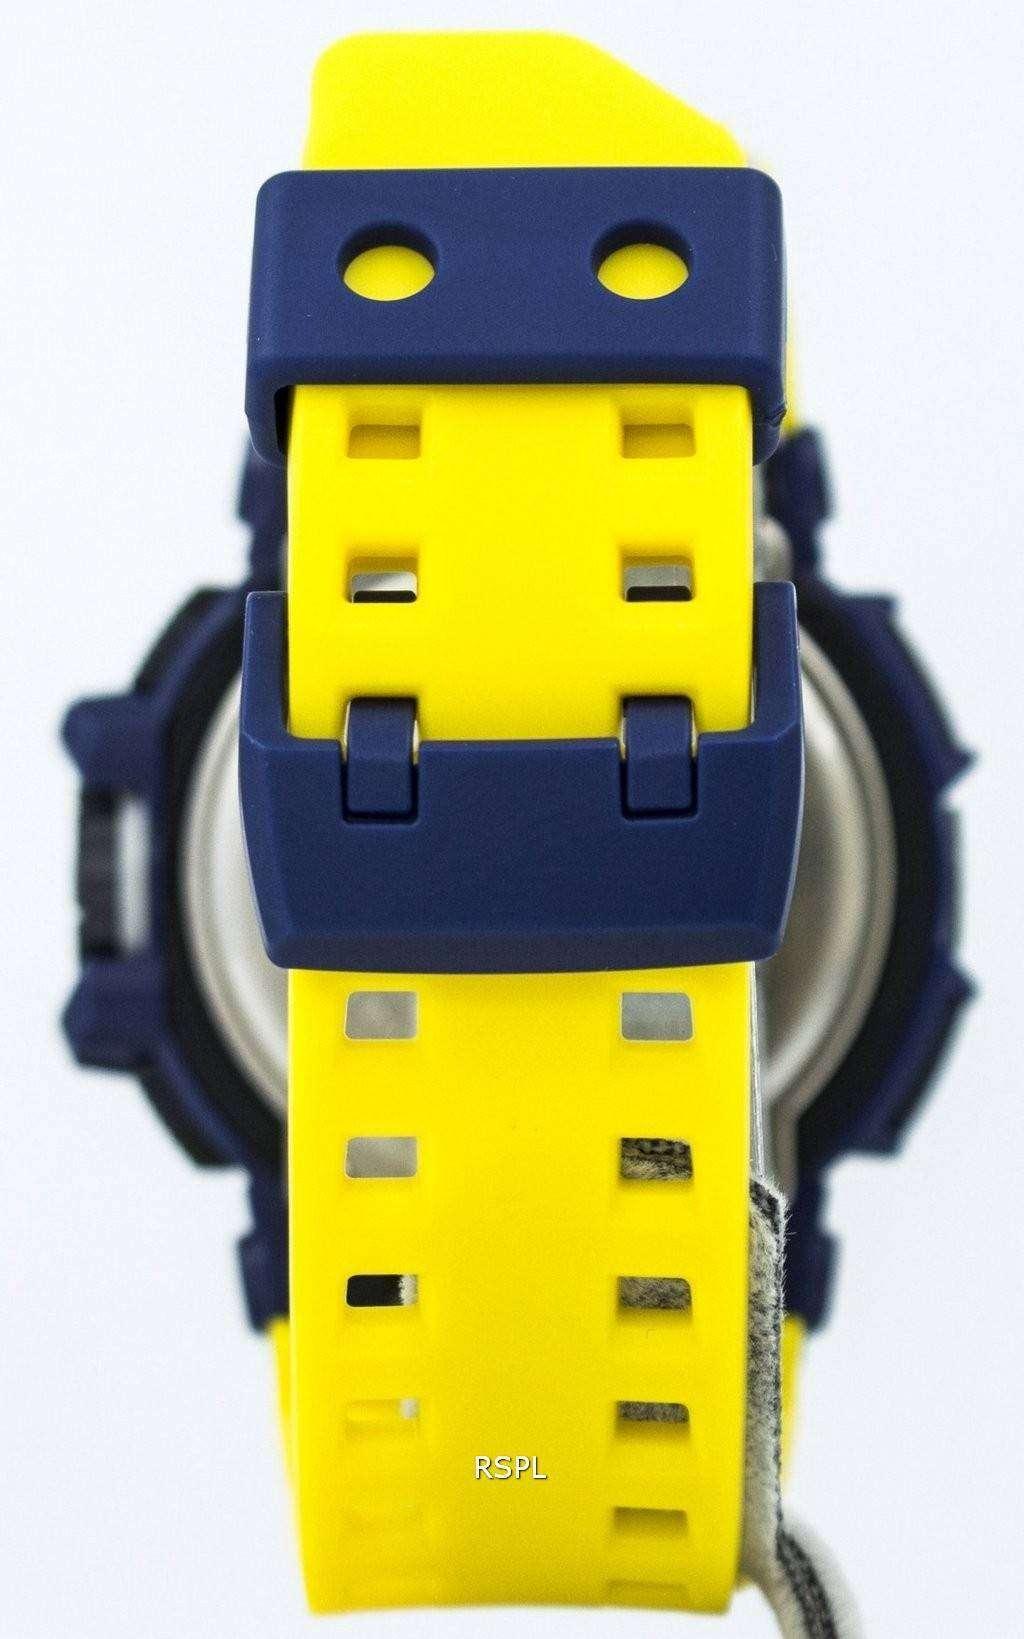 Casio G Shock Analog Digital Multi Color 200m Ga 400 9b Mens Watch Gd X6900ht 2 Resin Band Blue